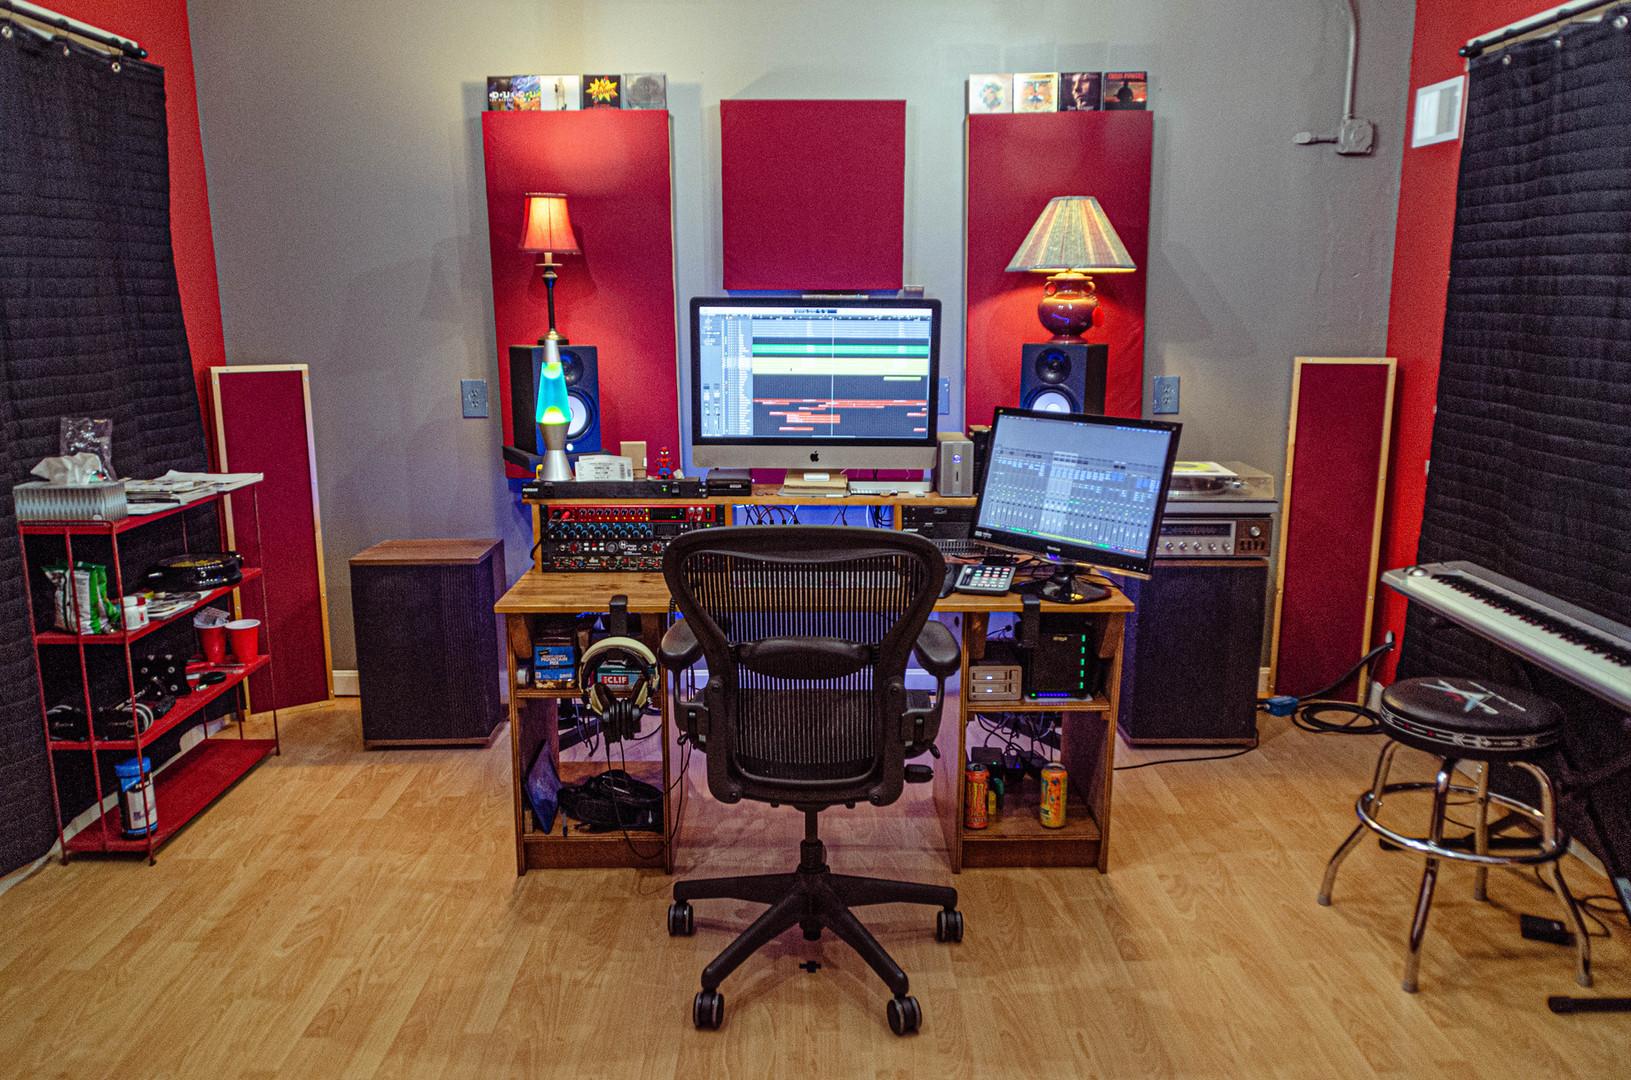 Control Room - Desk